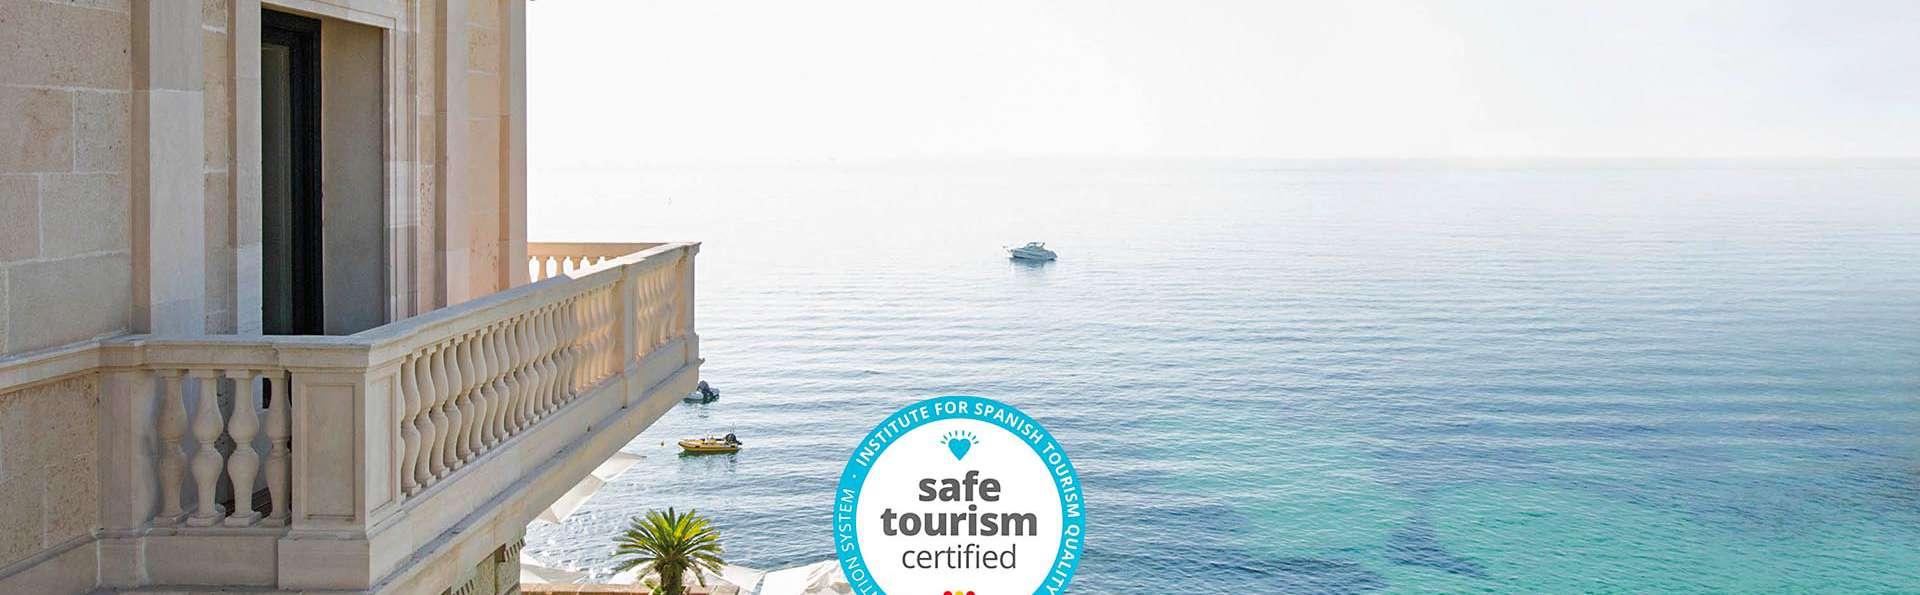 Hospes Maricel & Spa - EDIT_MALLORCA_Safe_Tourism_01.jpg